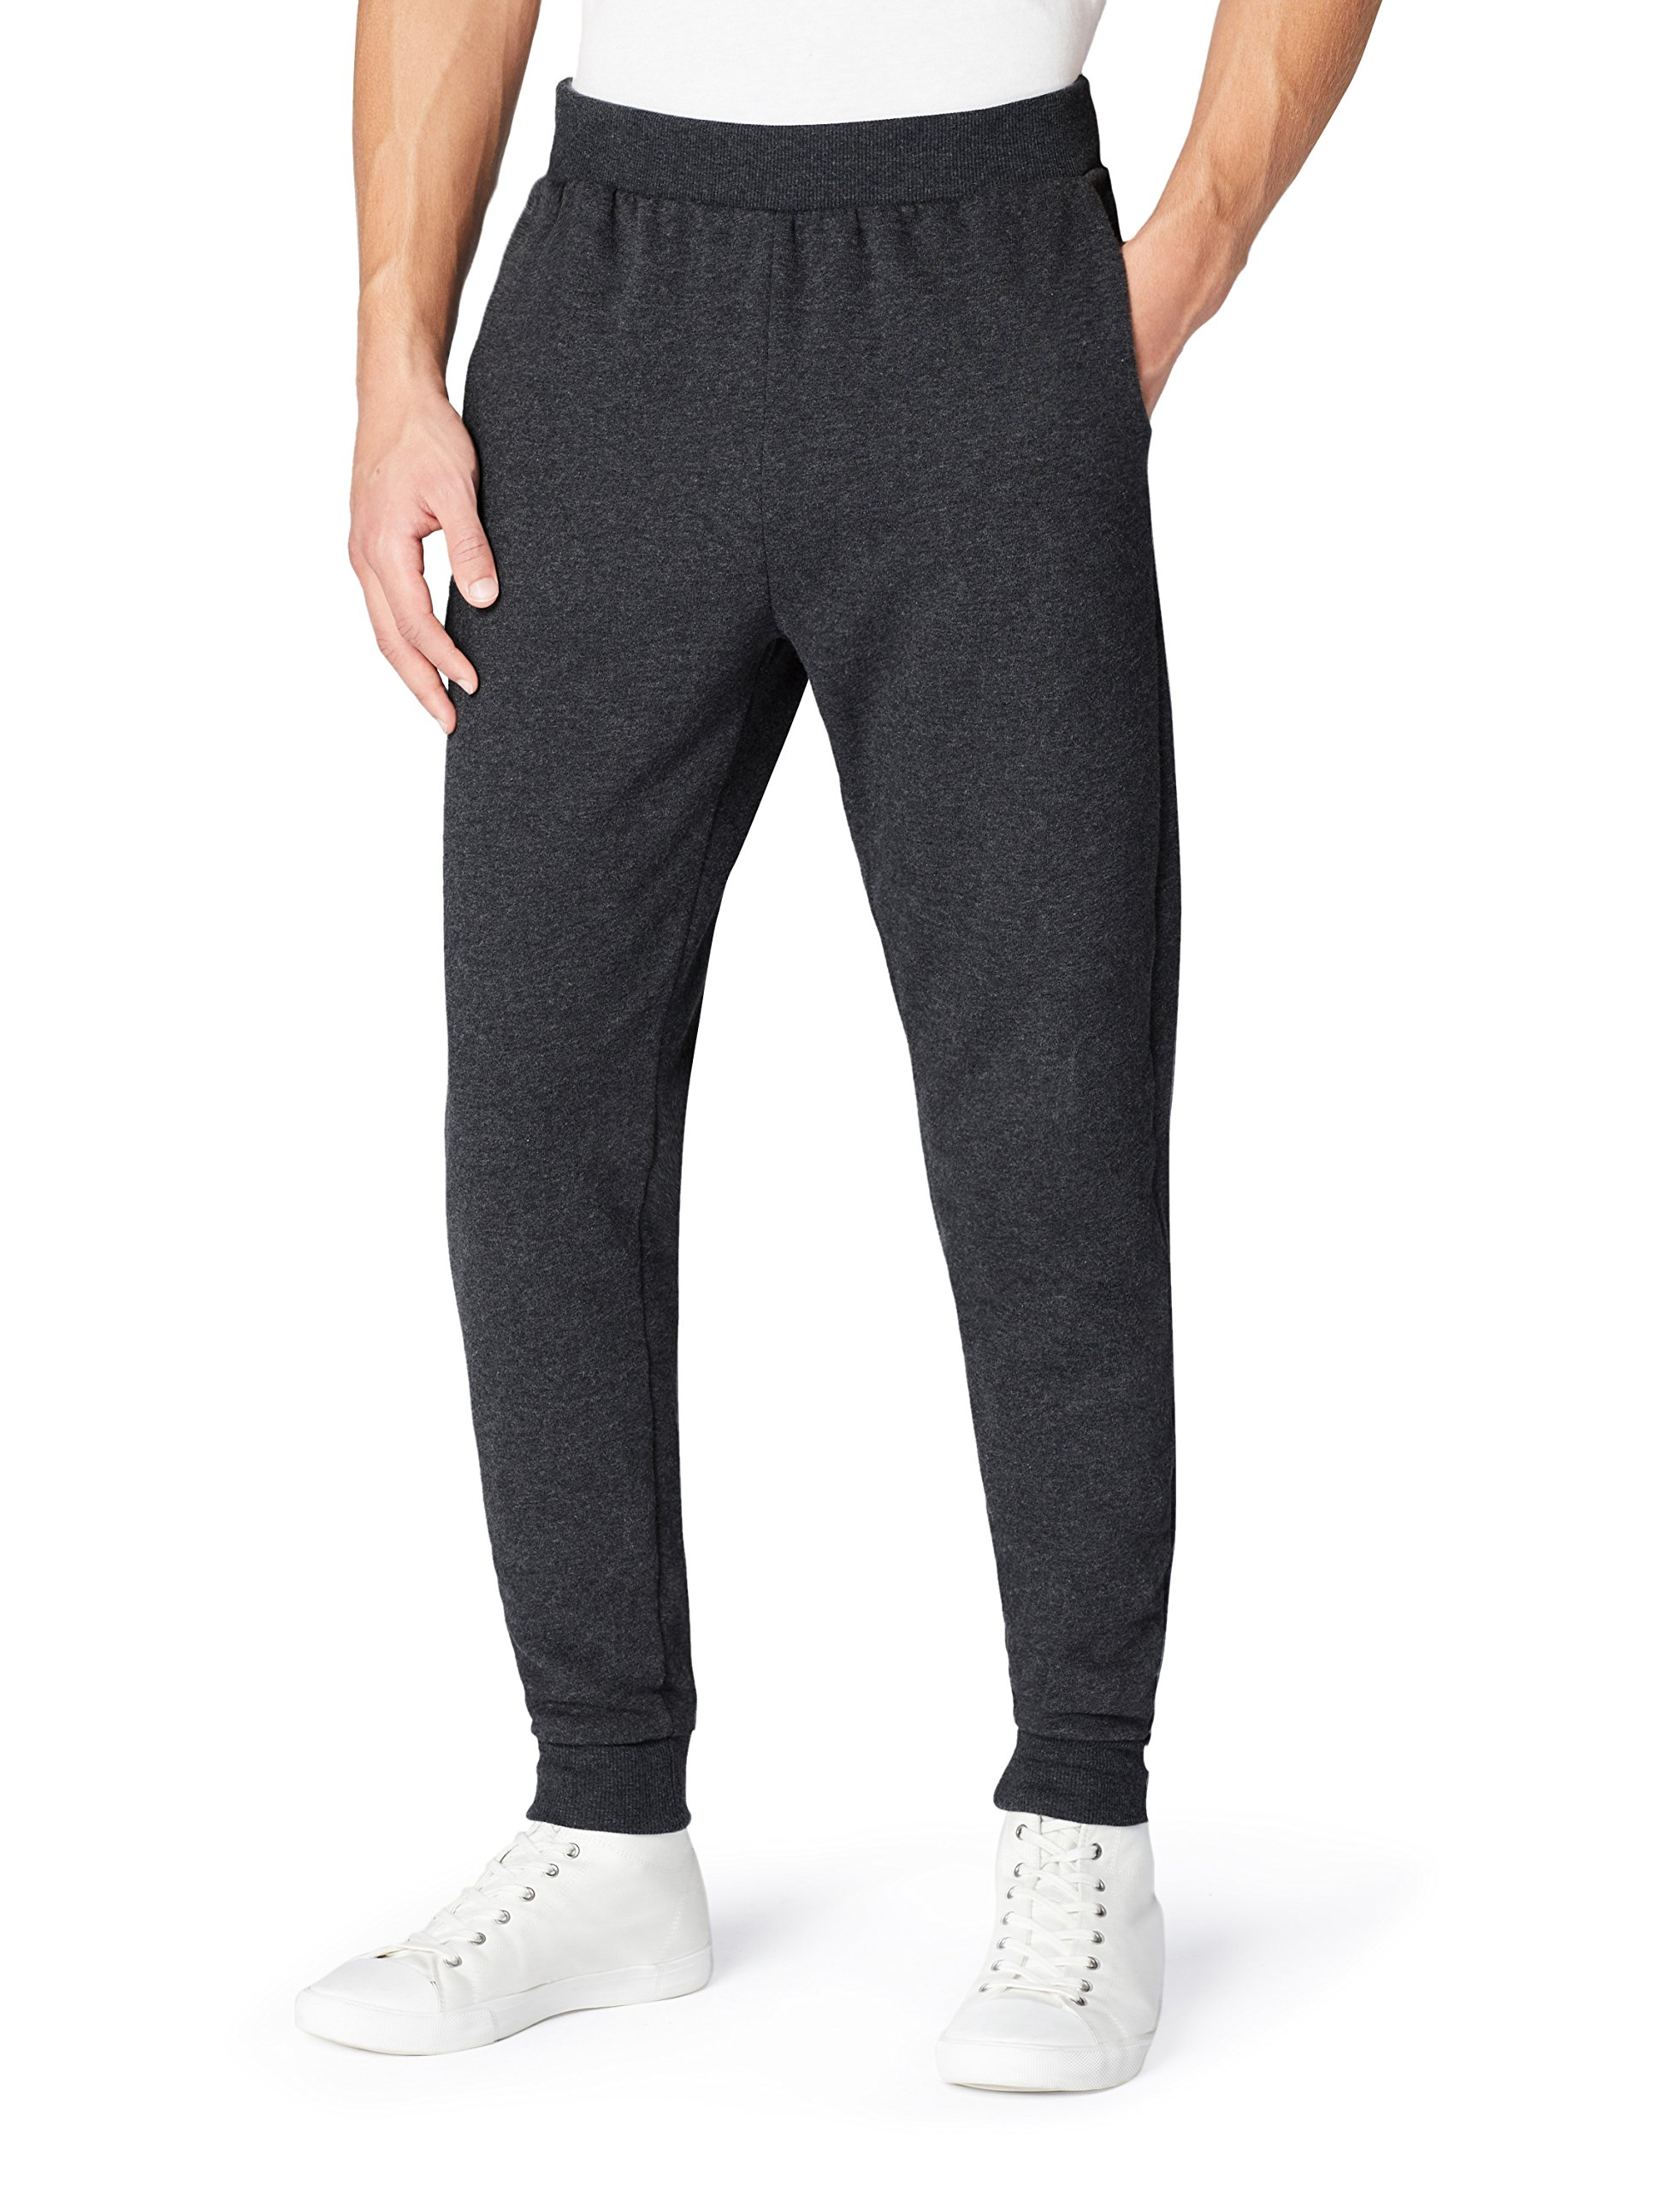 find. Pantalones Estilo Jogger de Tacto Suave para Hombre product image